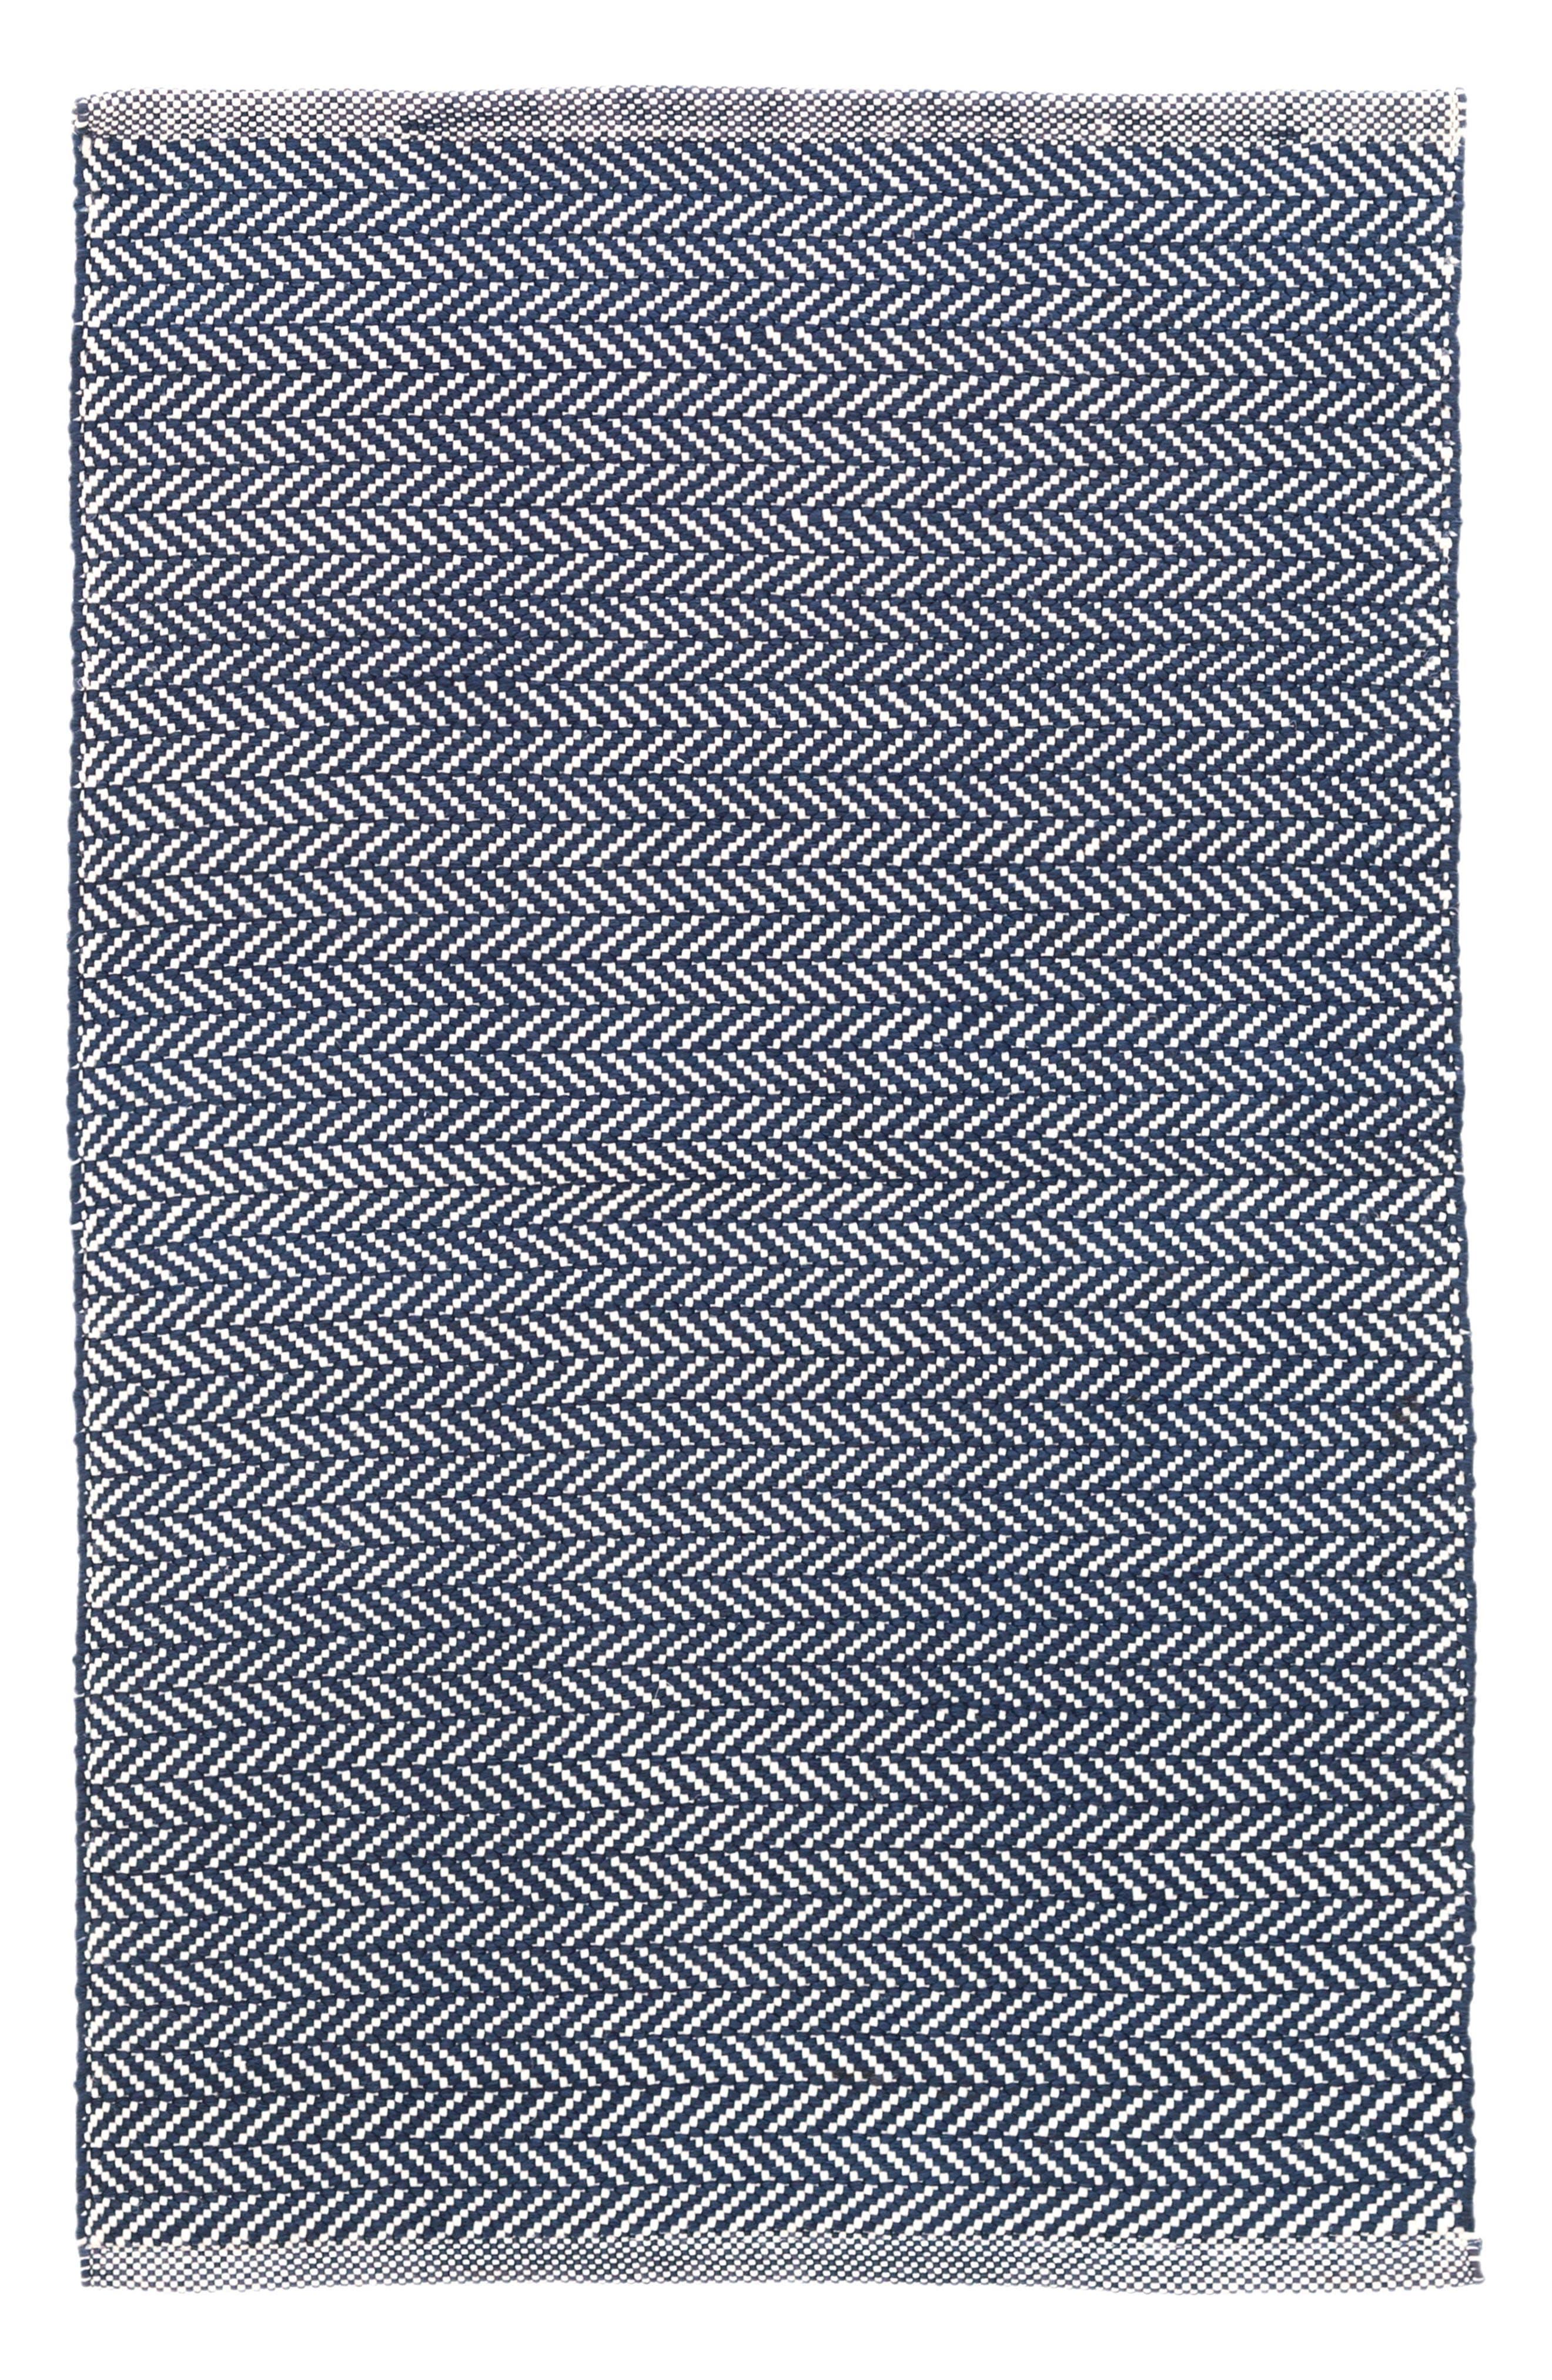 Herringbone Rug,                             Main thumbnail 1, color,                             Indigo